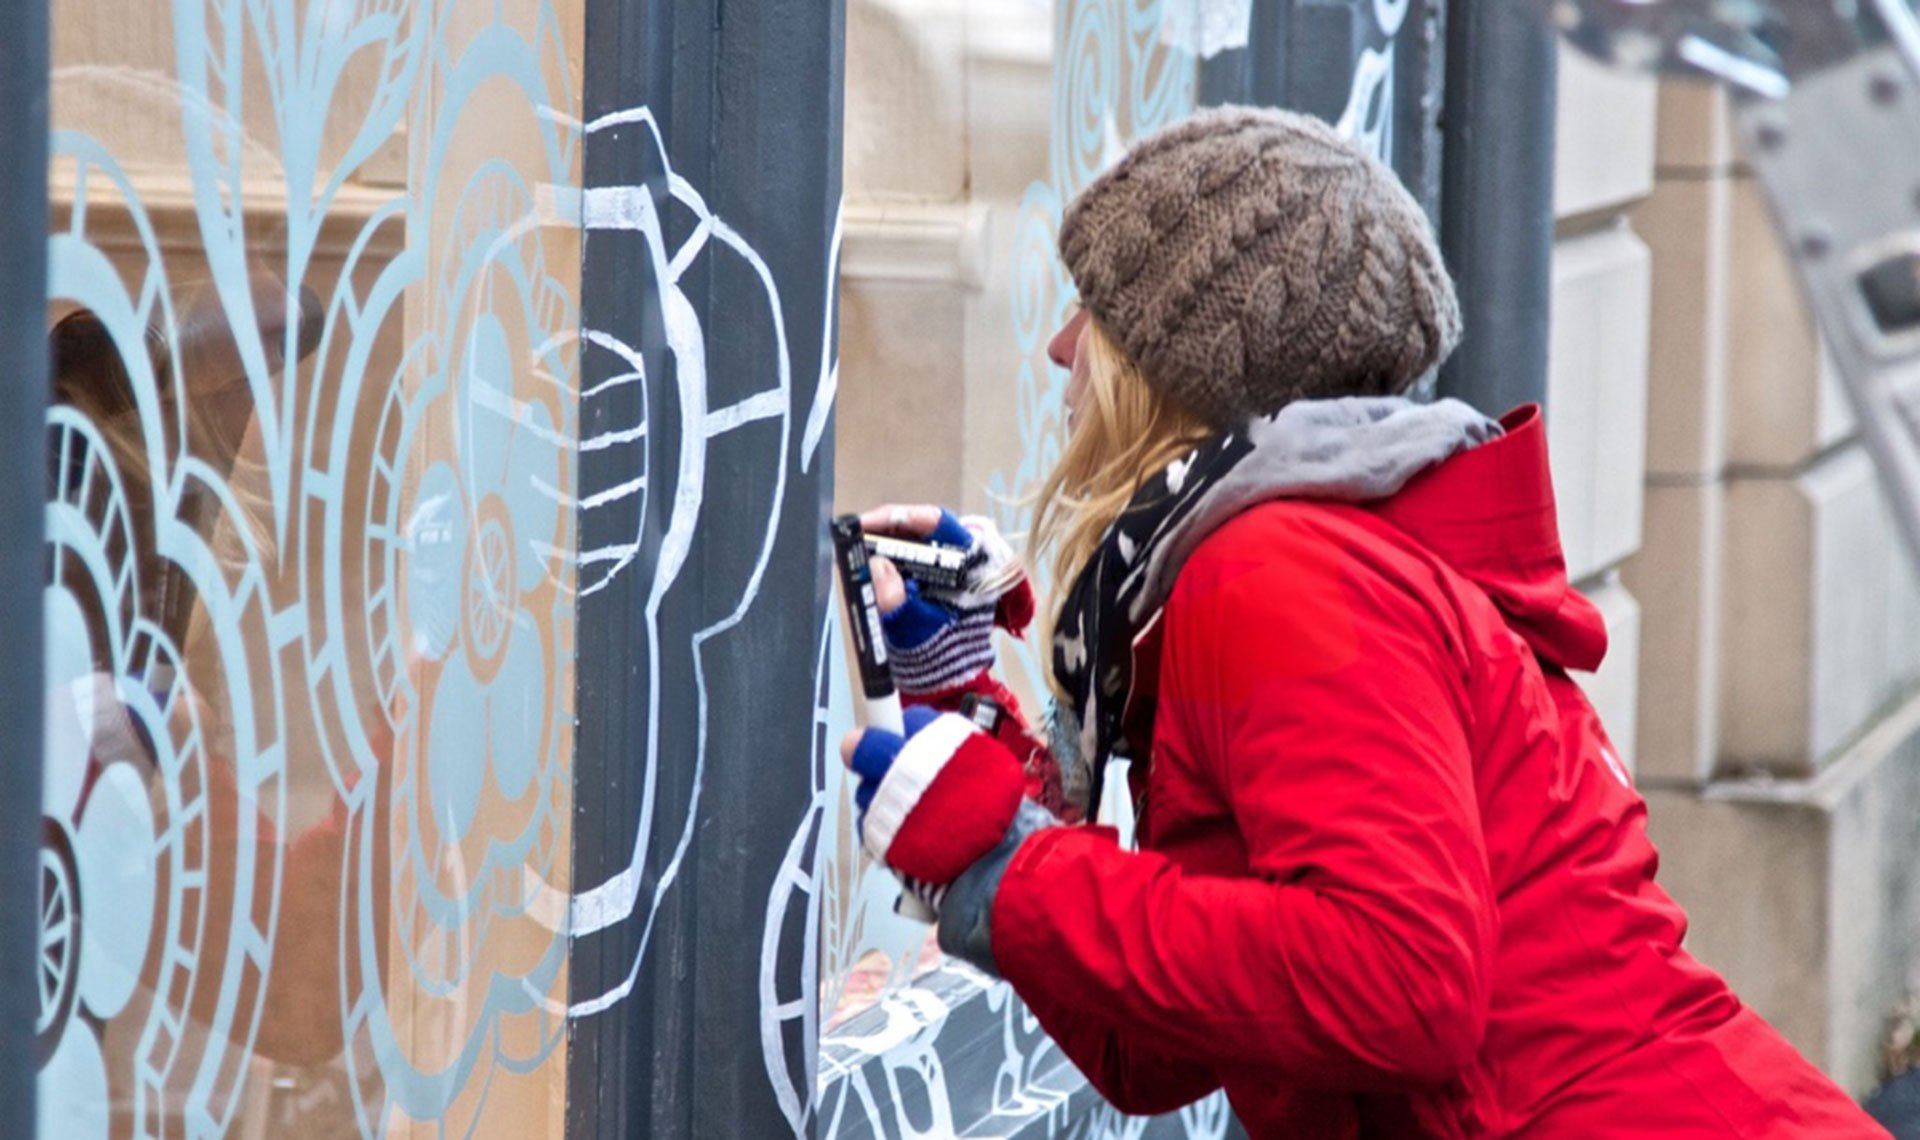 Kate George painting Bindi artwork on window